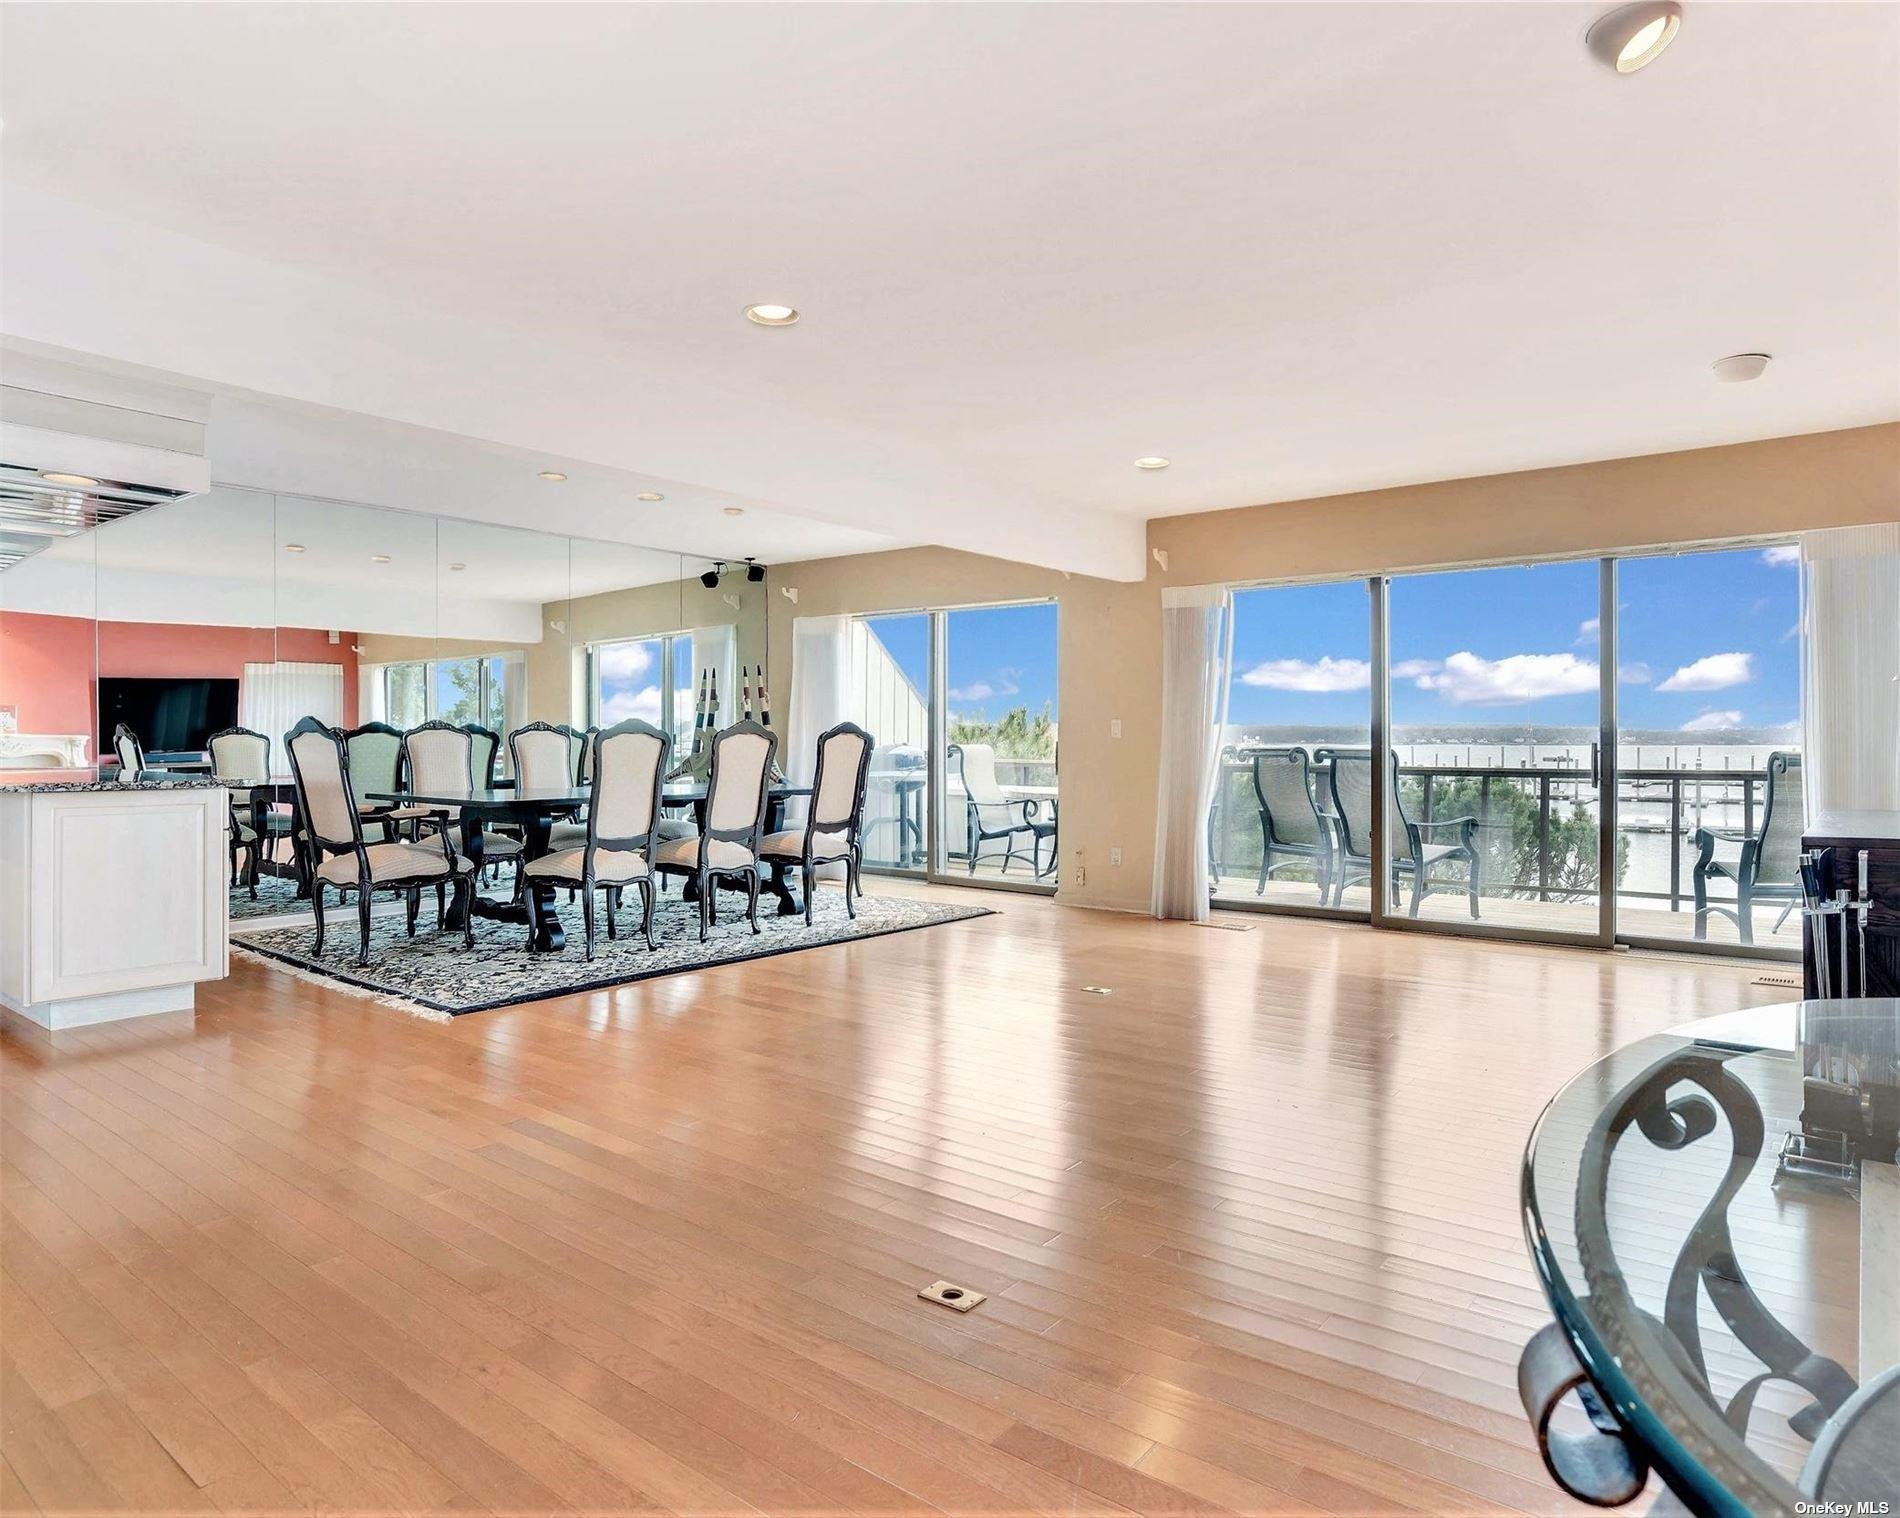 Property for sale at 13 The Quarterdeck, Port Washington,  New York 11050